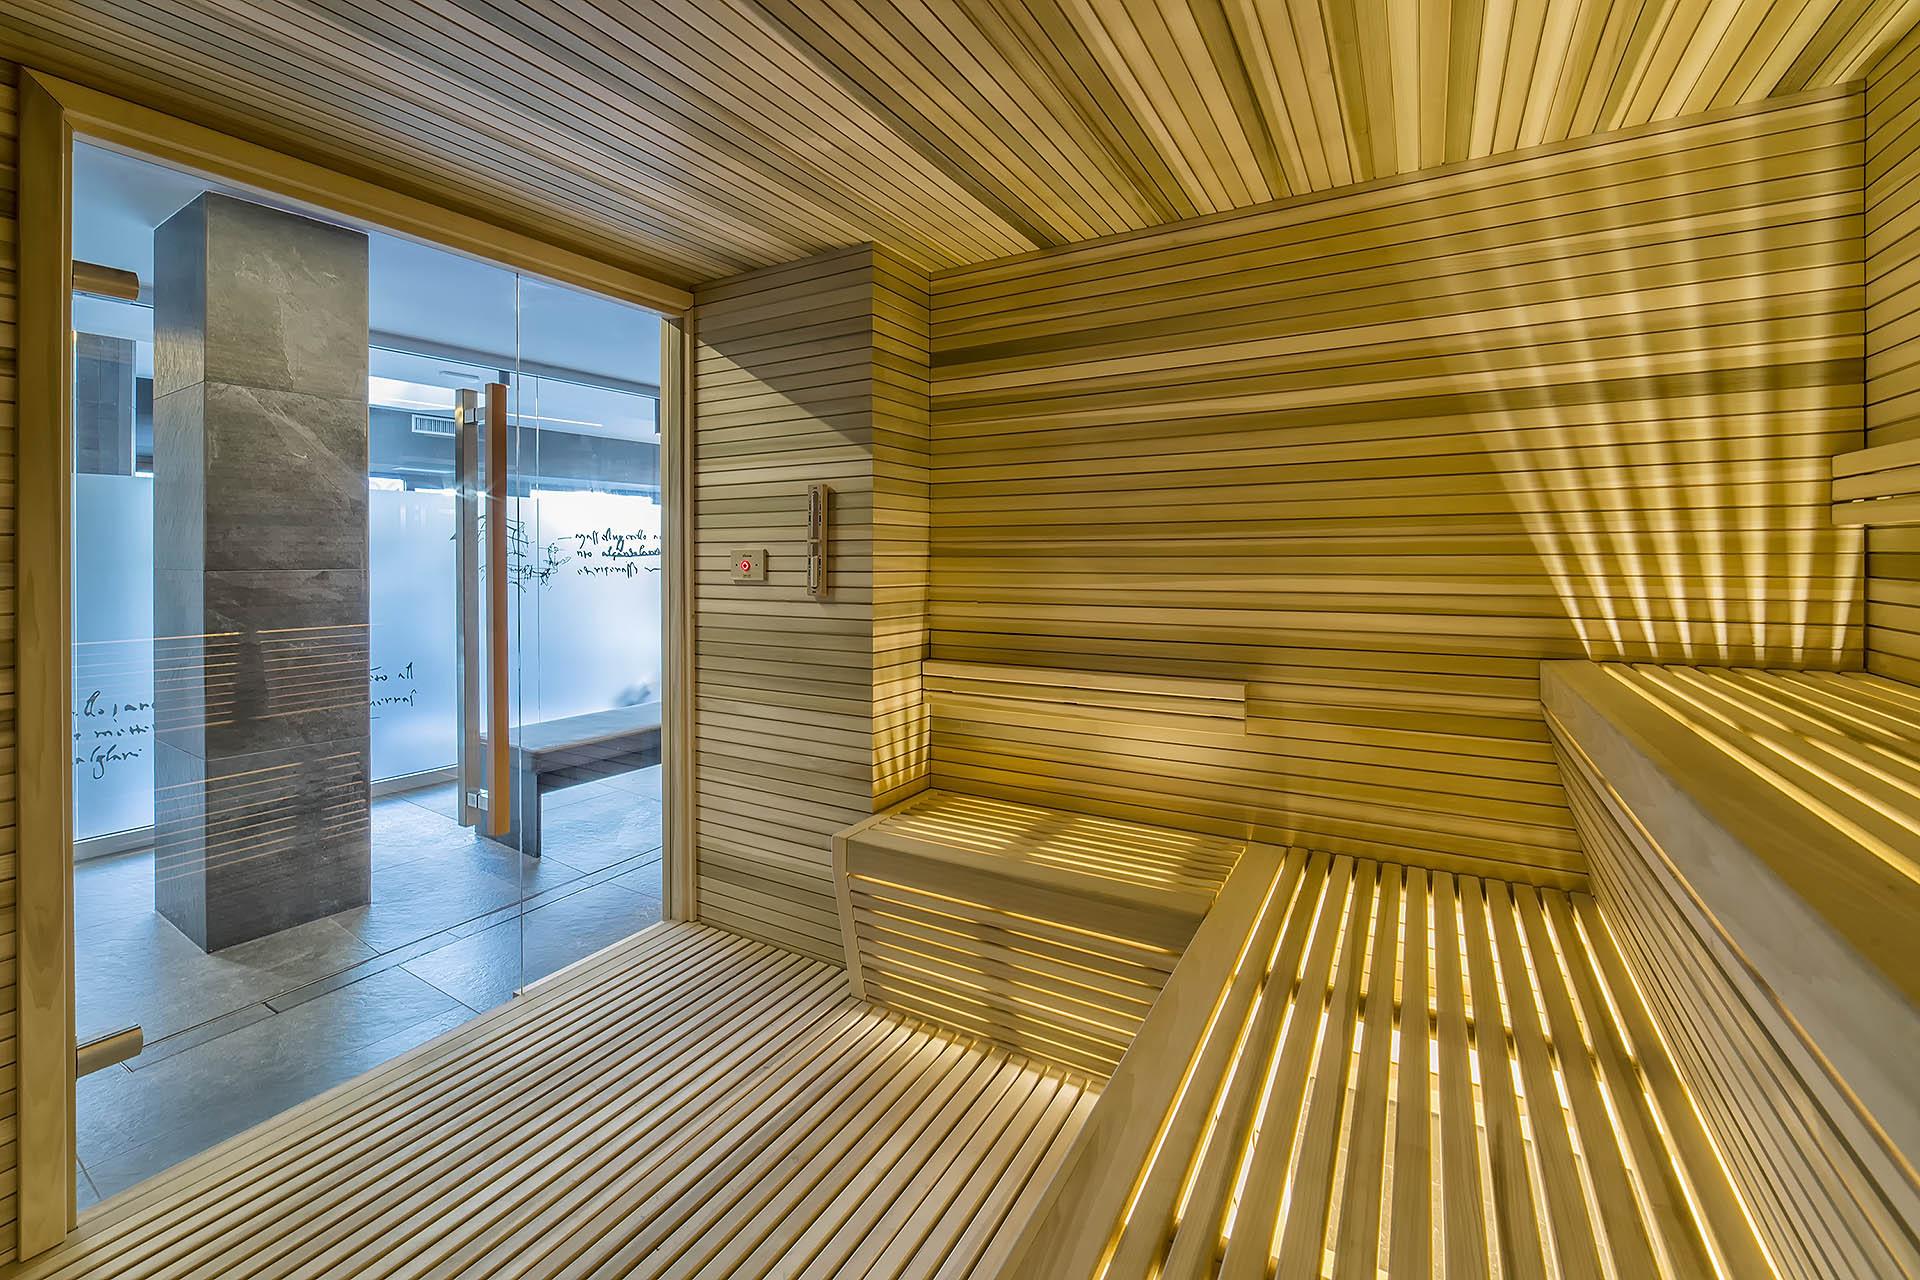 SAUNA FINLANDESE<br /> HOTEL LEONARDO DA VINCI - BIBIONE (VE)